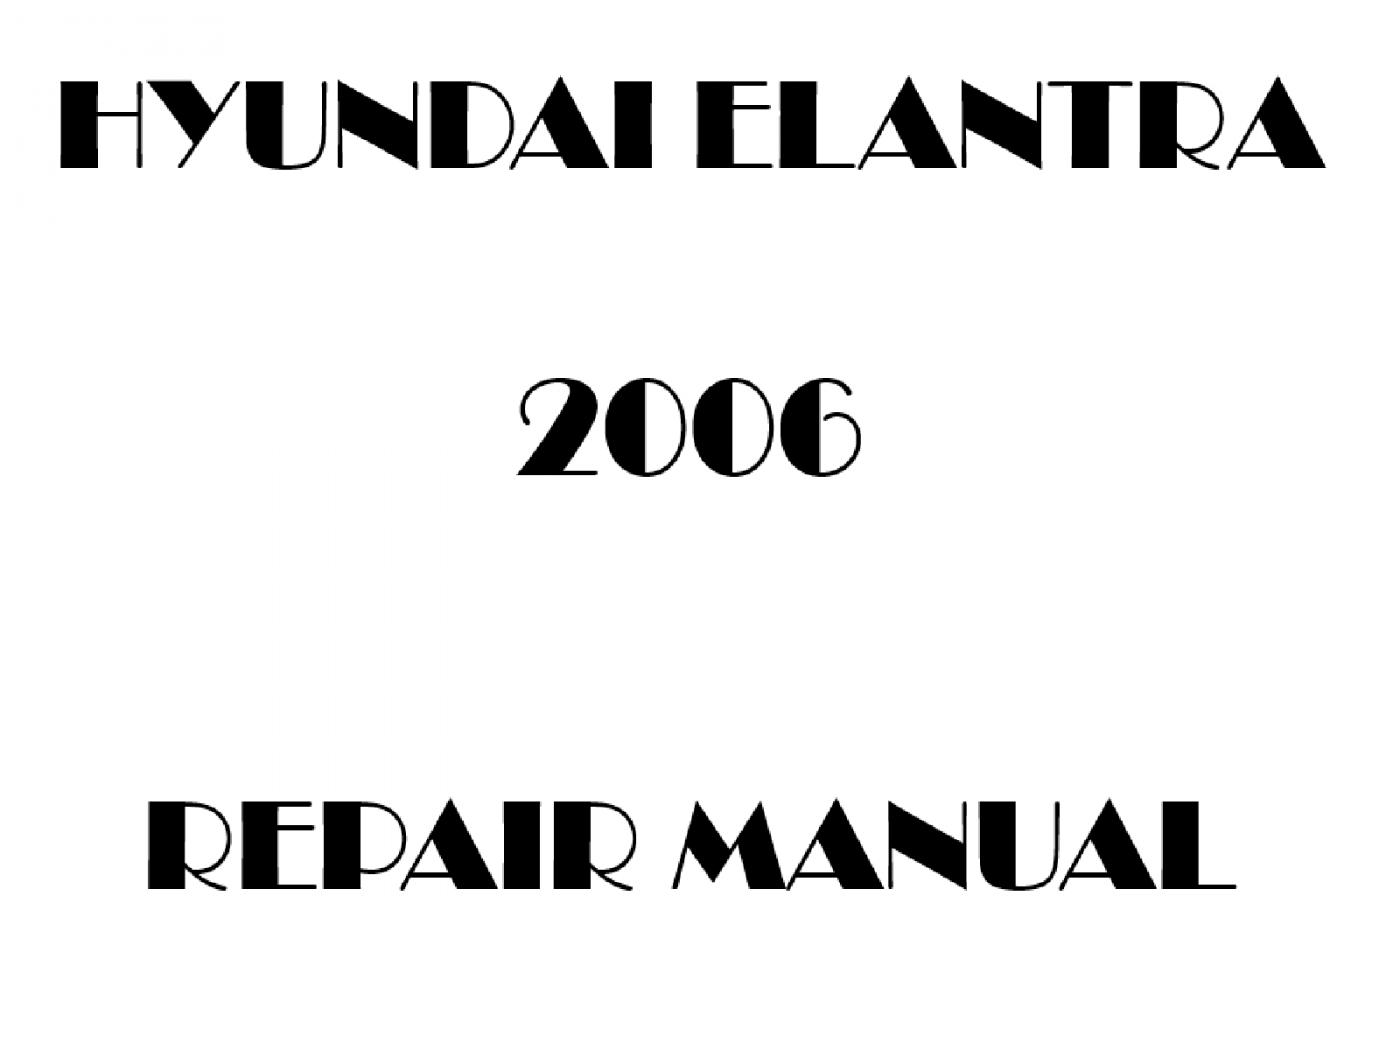 2006 Hyundai Elantra repair manual